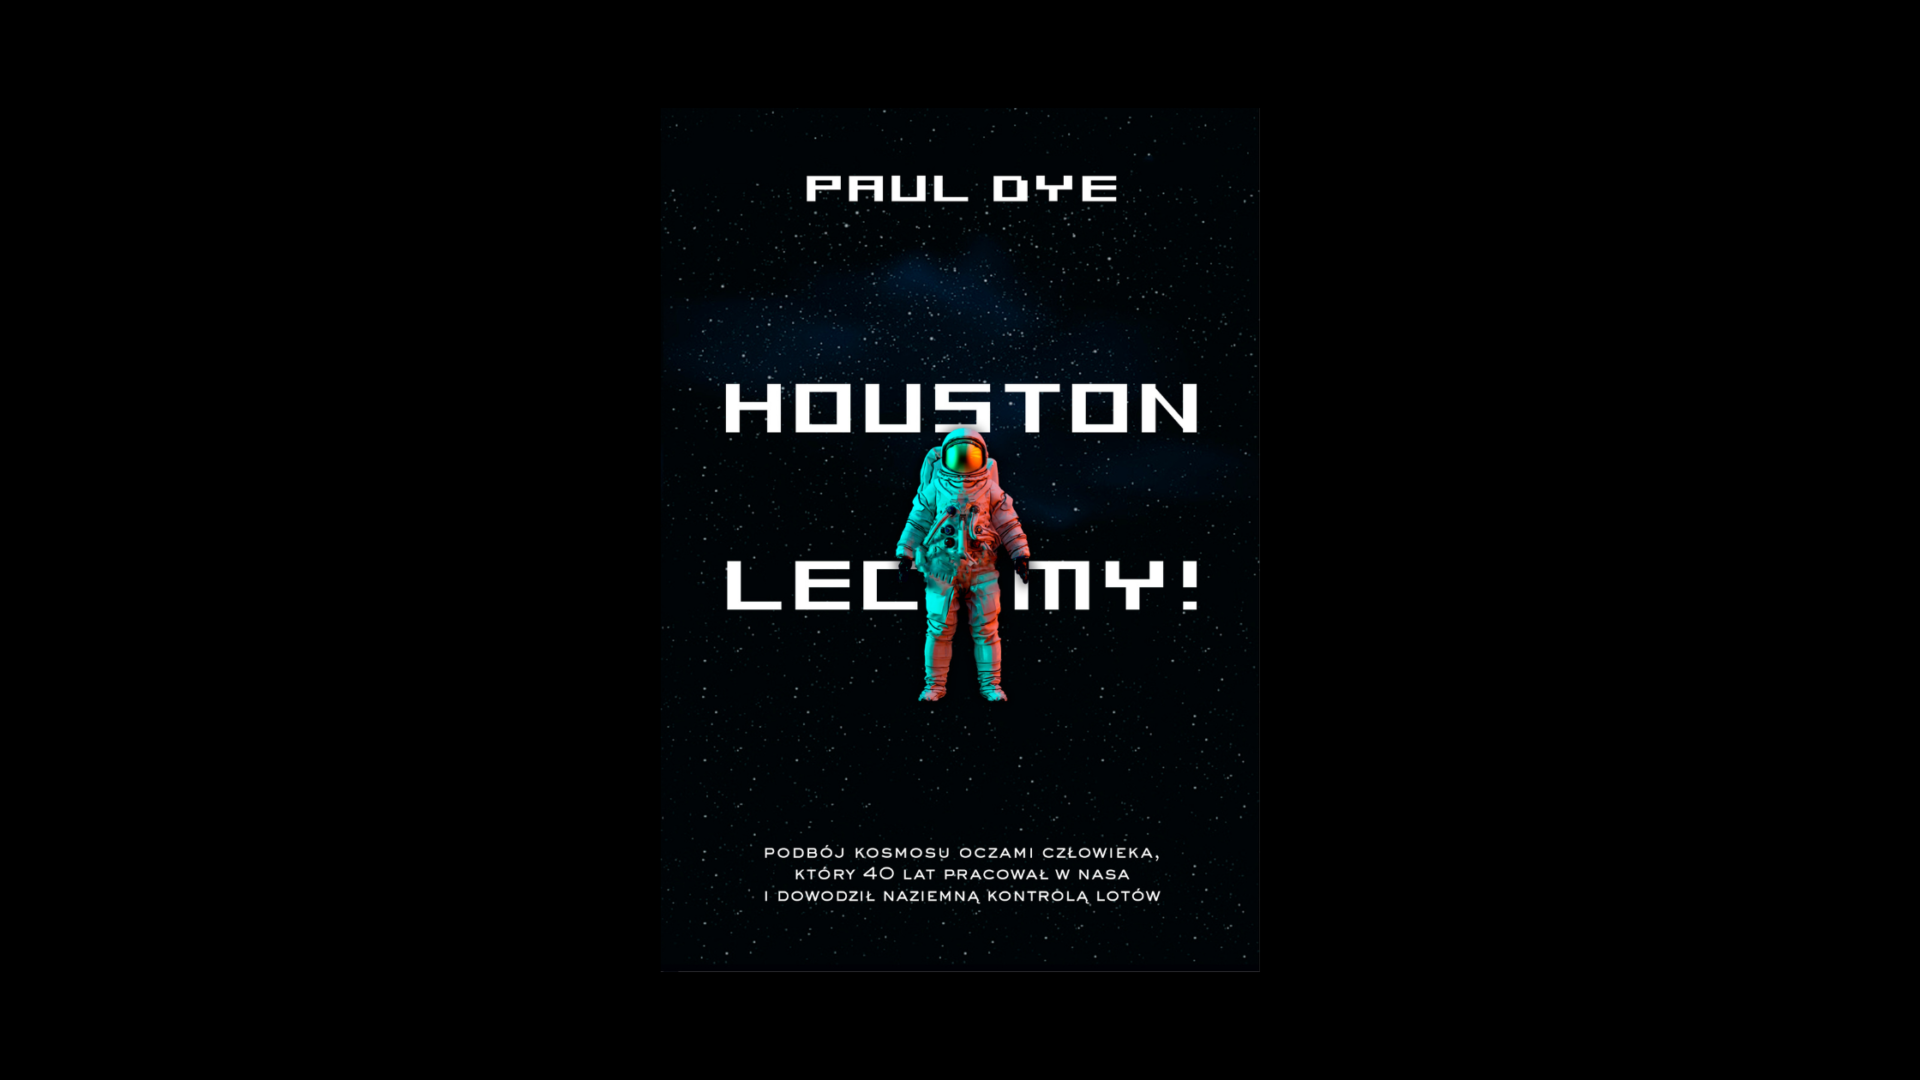 Houston, lecimy! - Paul Dye